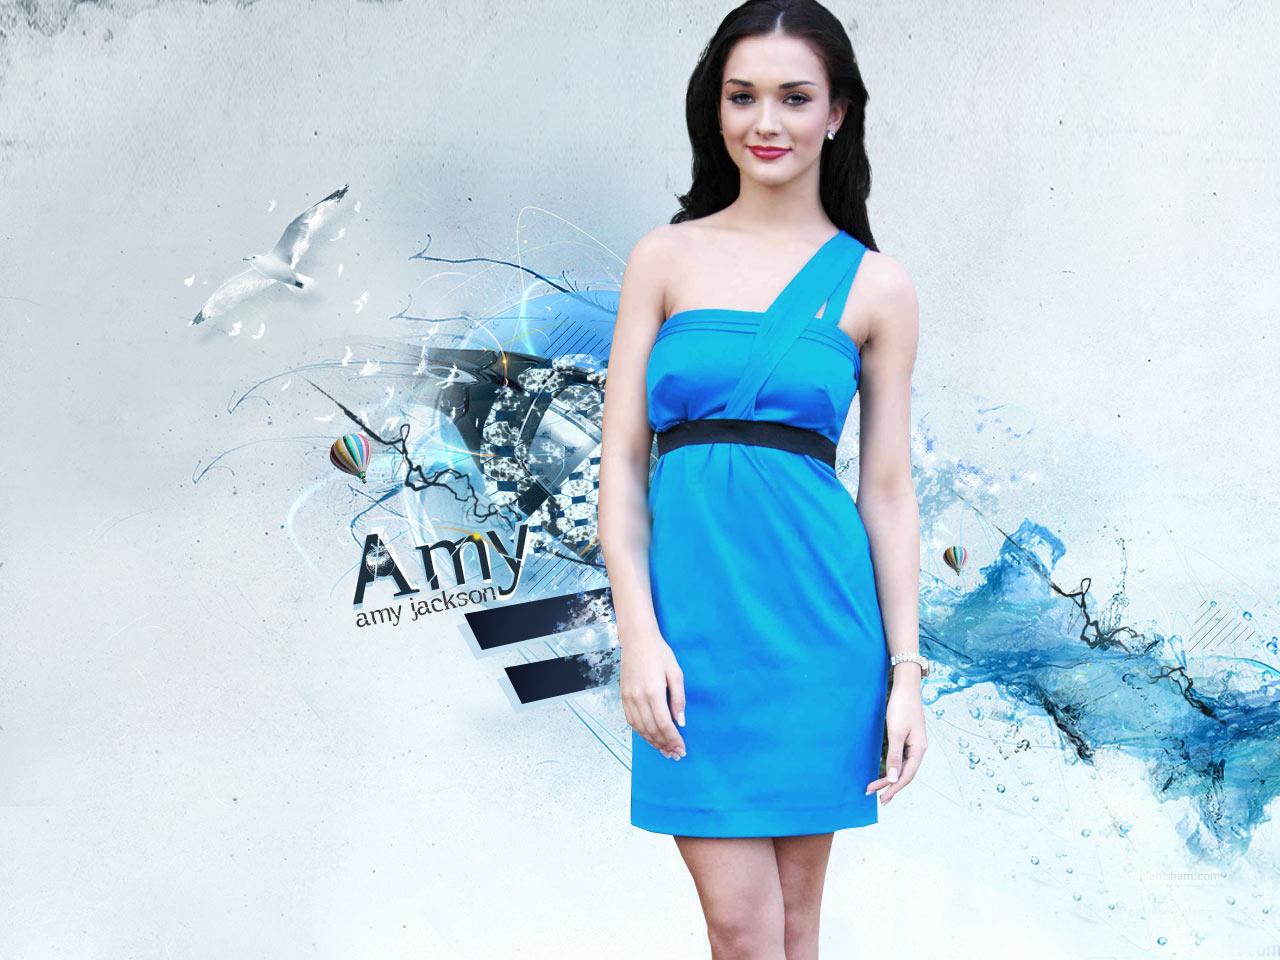 Amy jackson blue dress desktop wallpaper